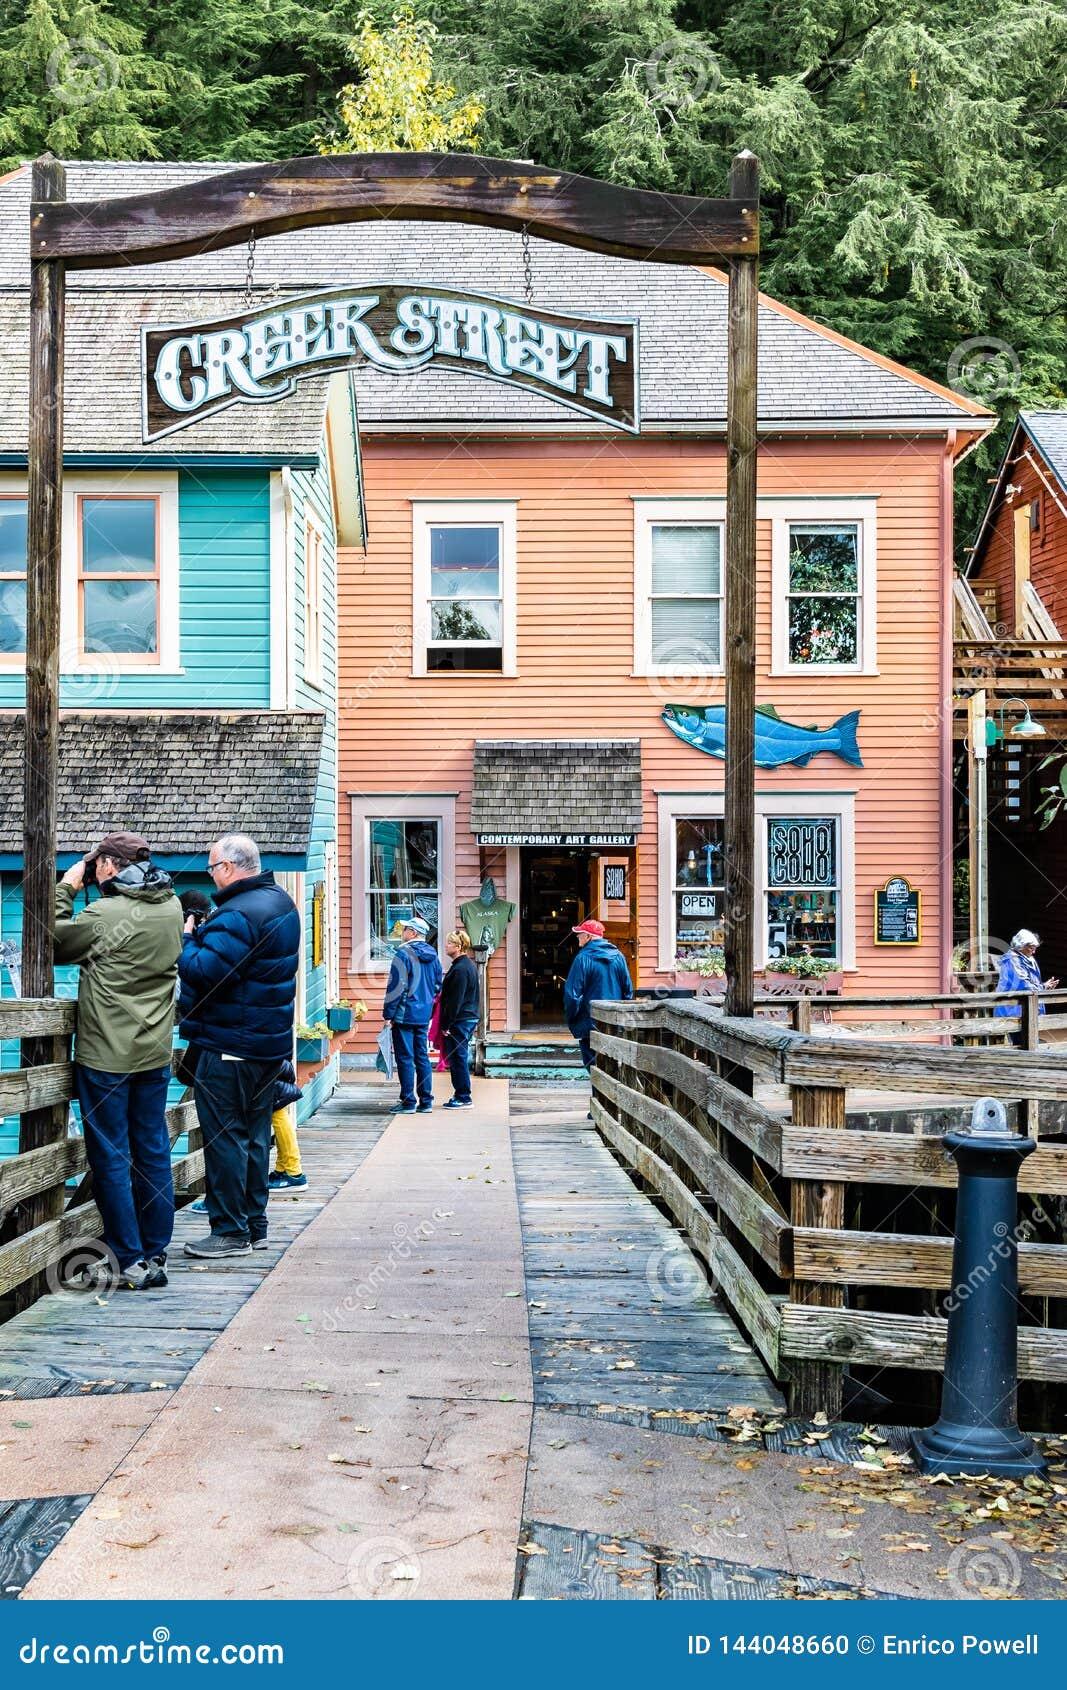 Creek Street, popular shopping location for tourists in Ketchikan Alaska